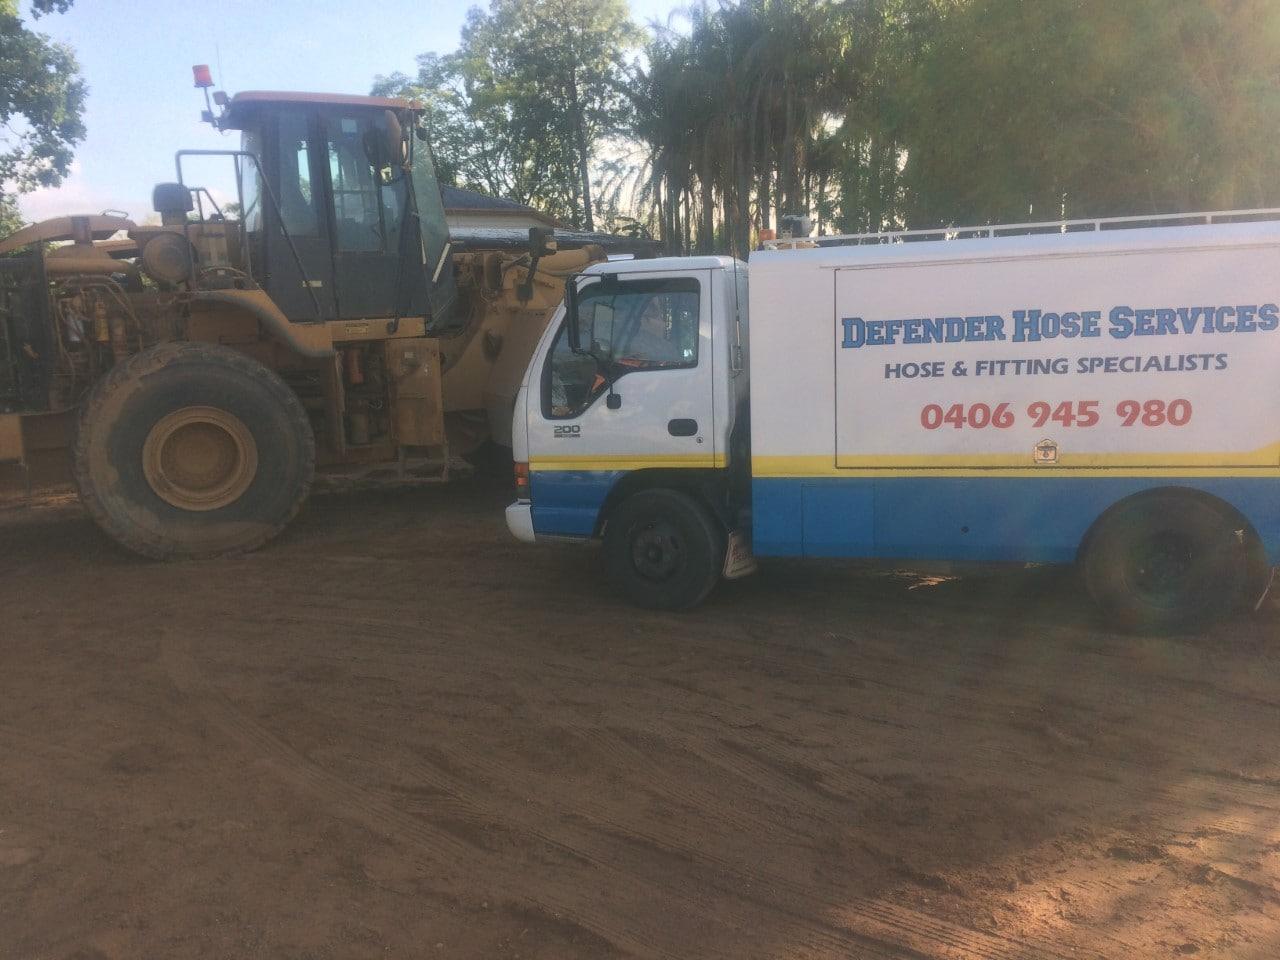 Defender Hose Services West on 13 Geraldine Ave, North Ipswich, QLD